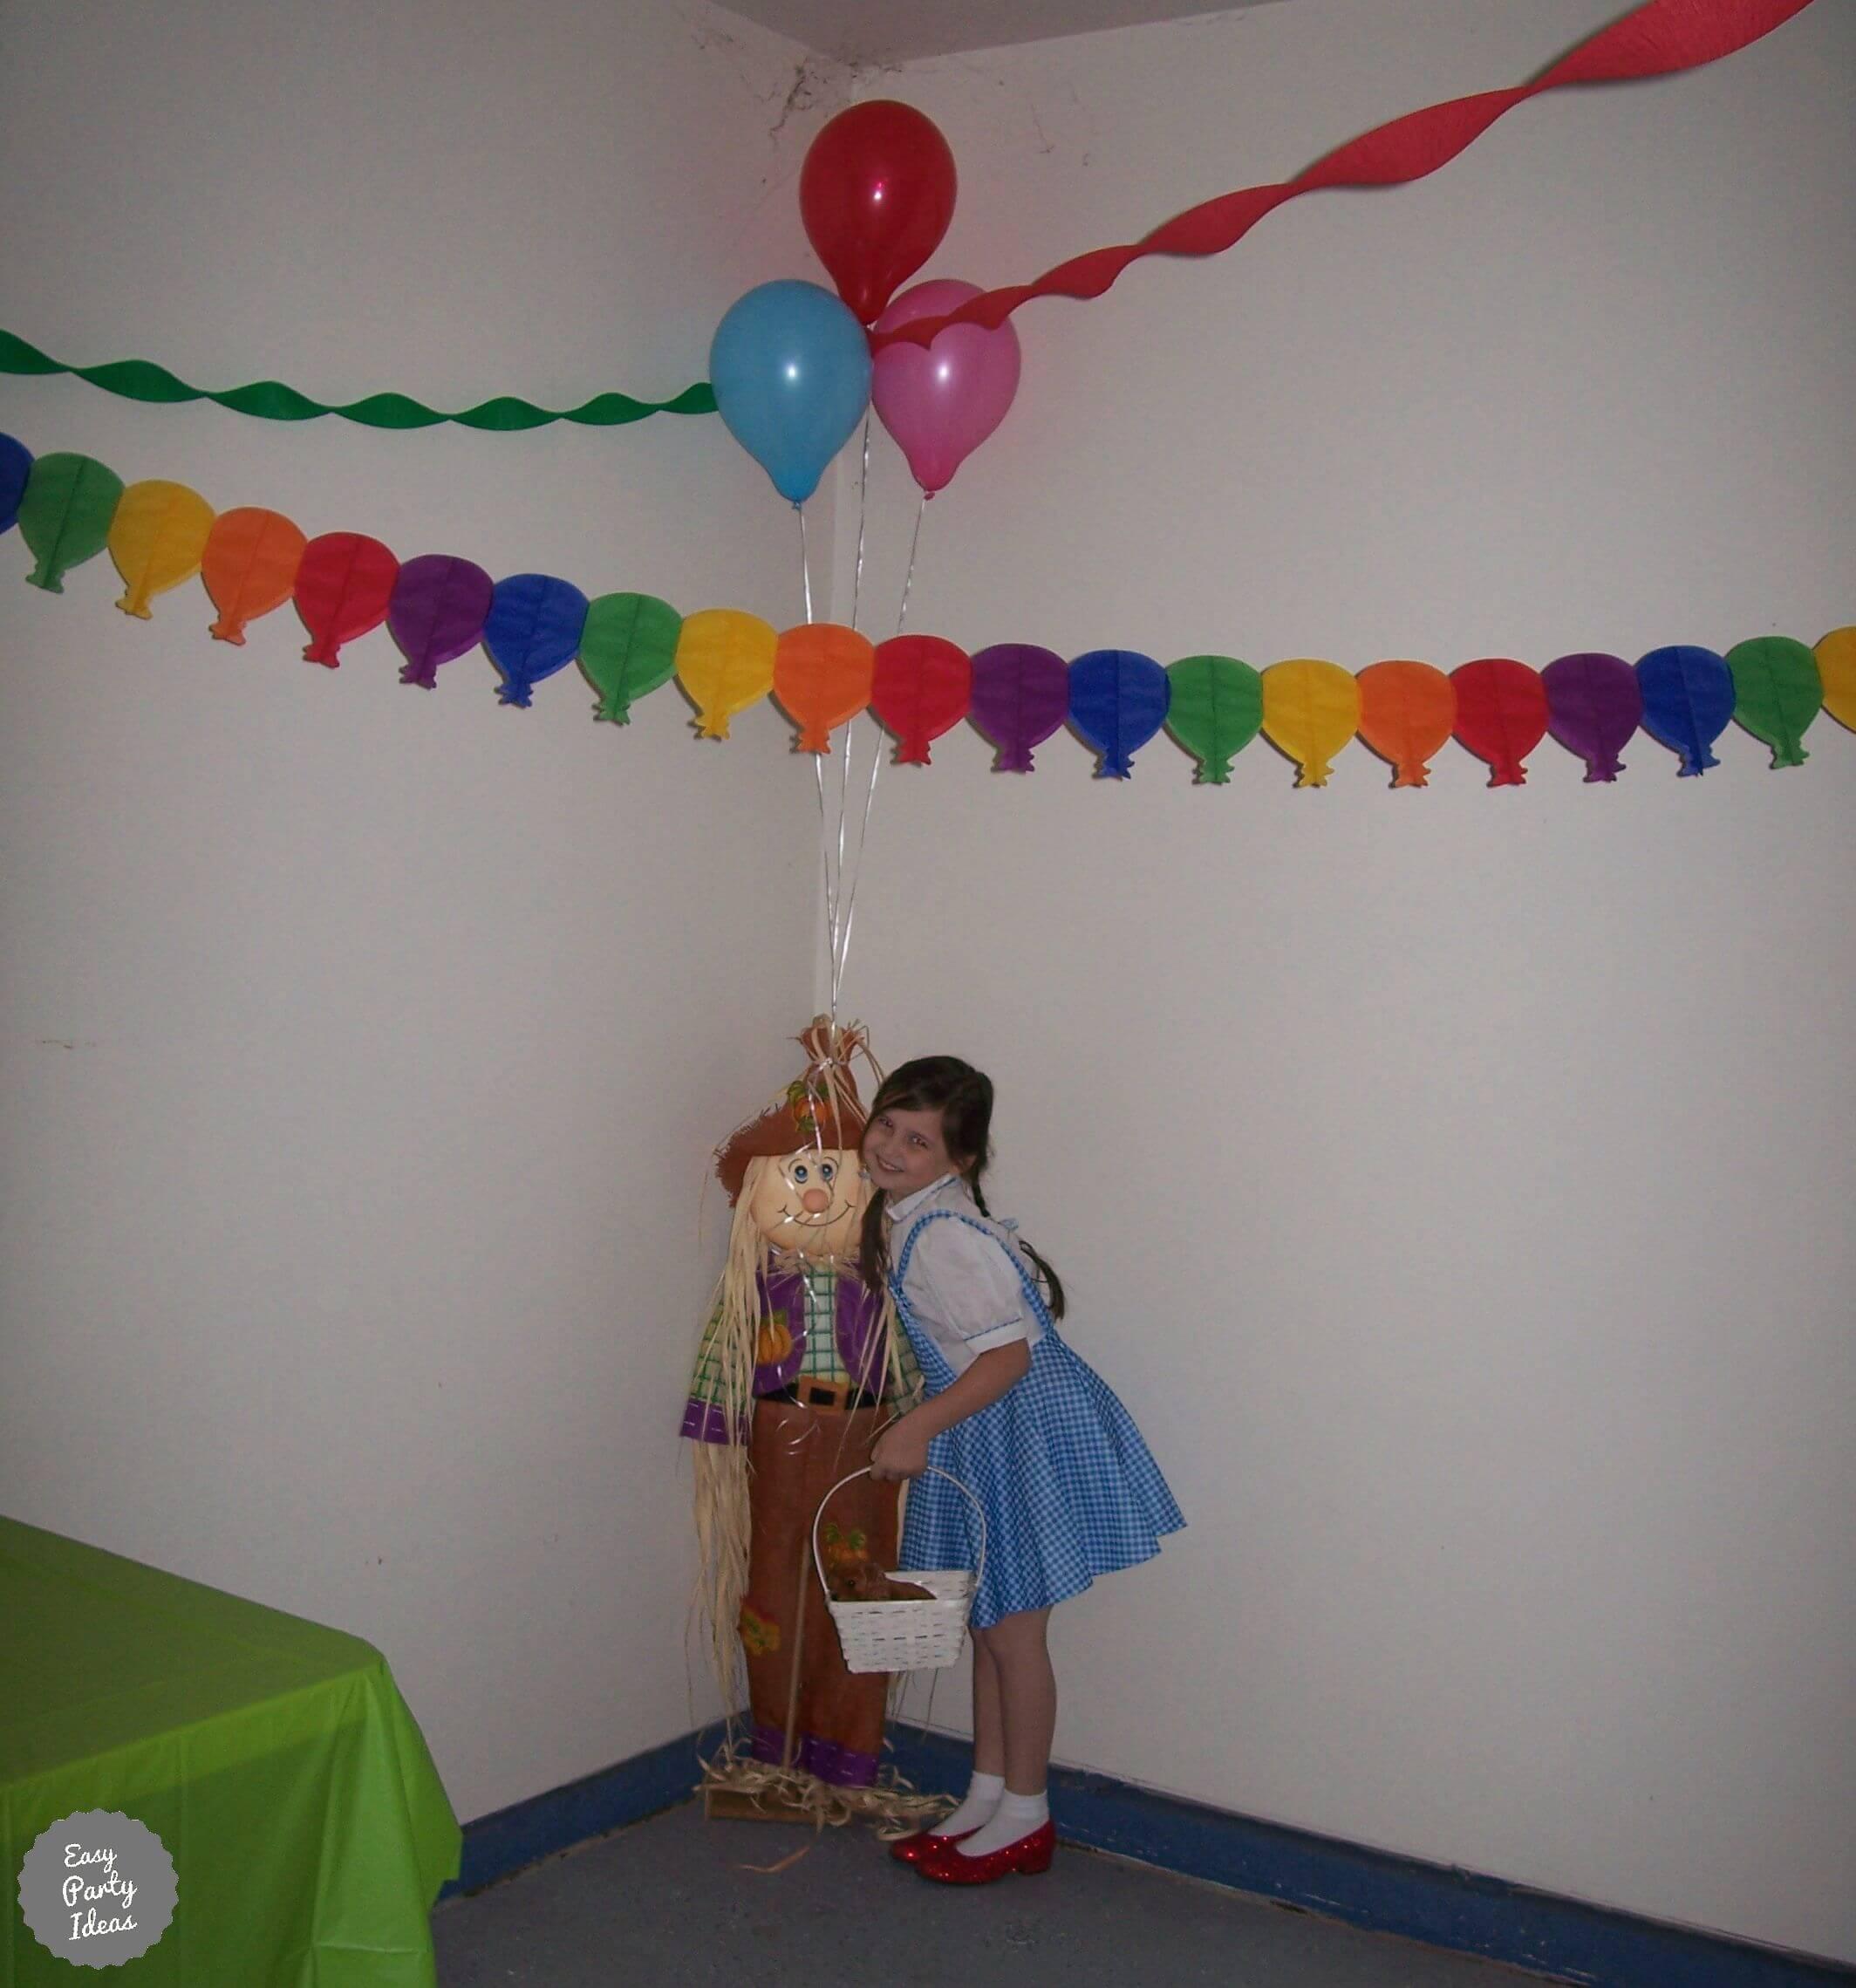 Wizard of Oz Party Photo Idea